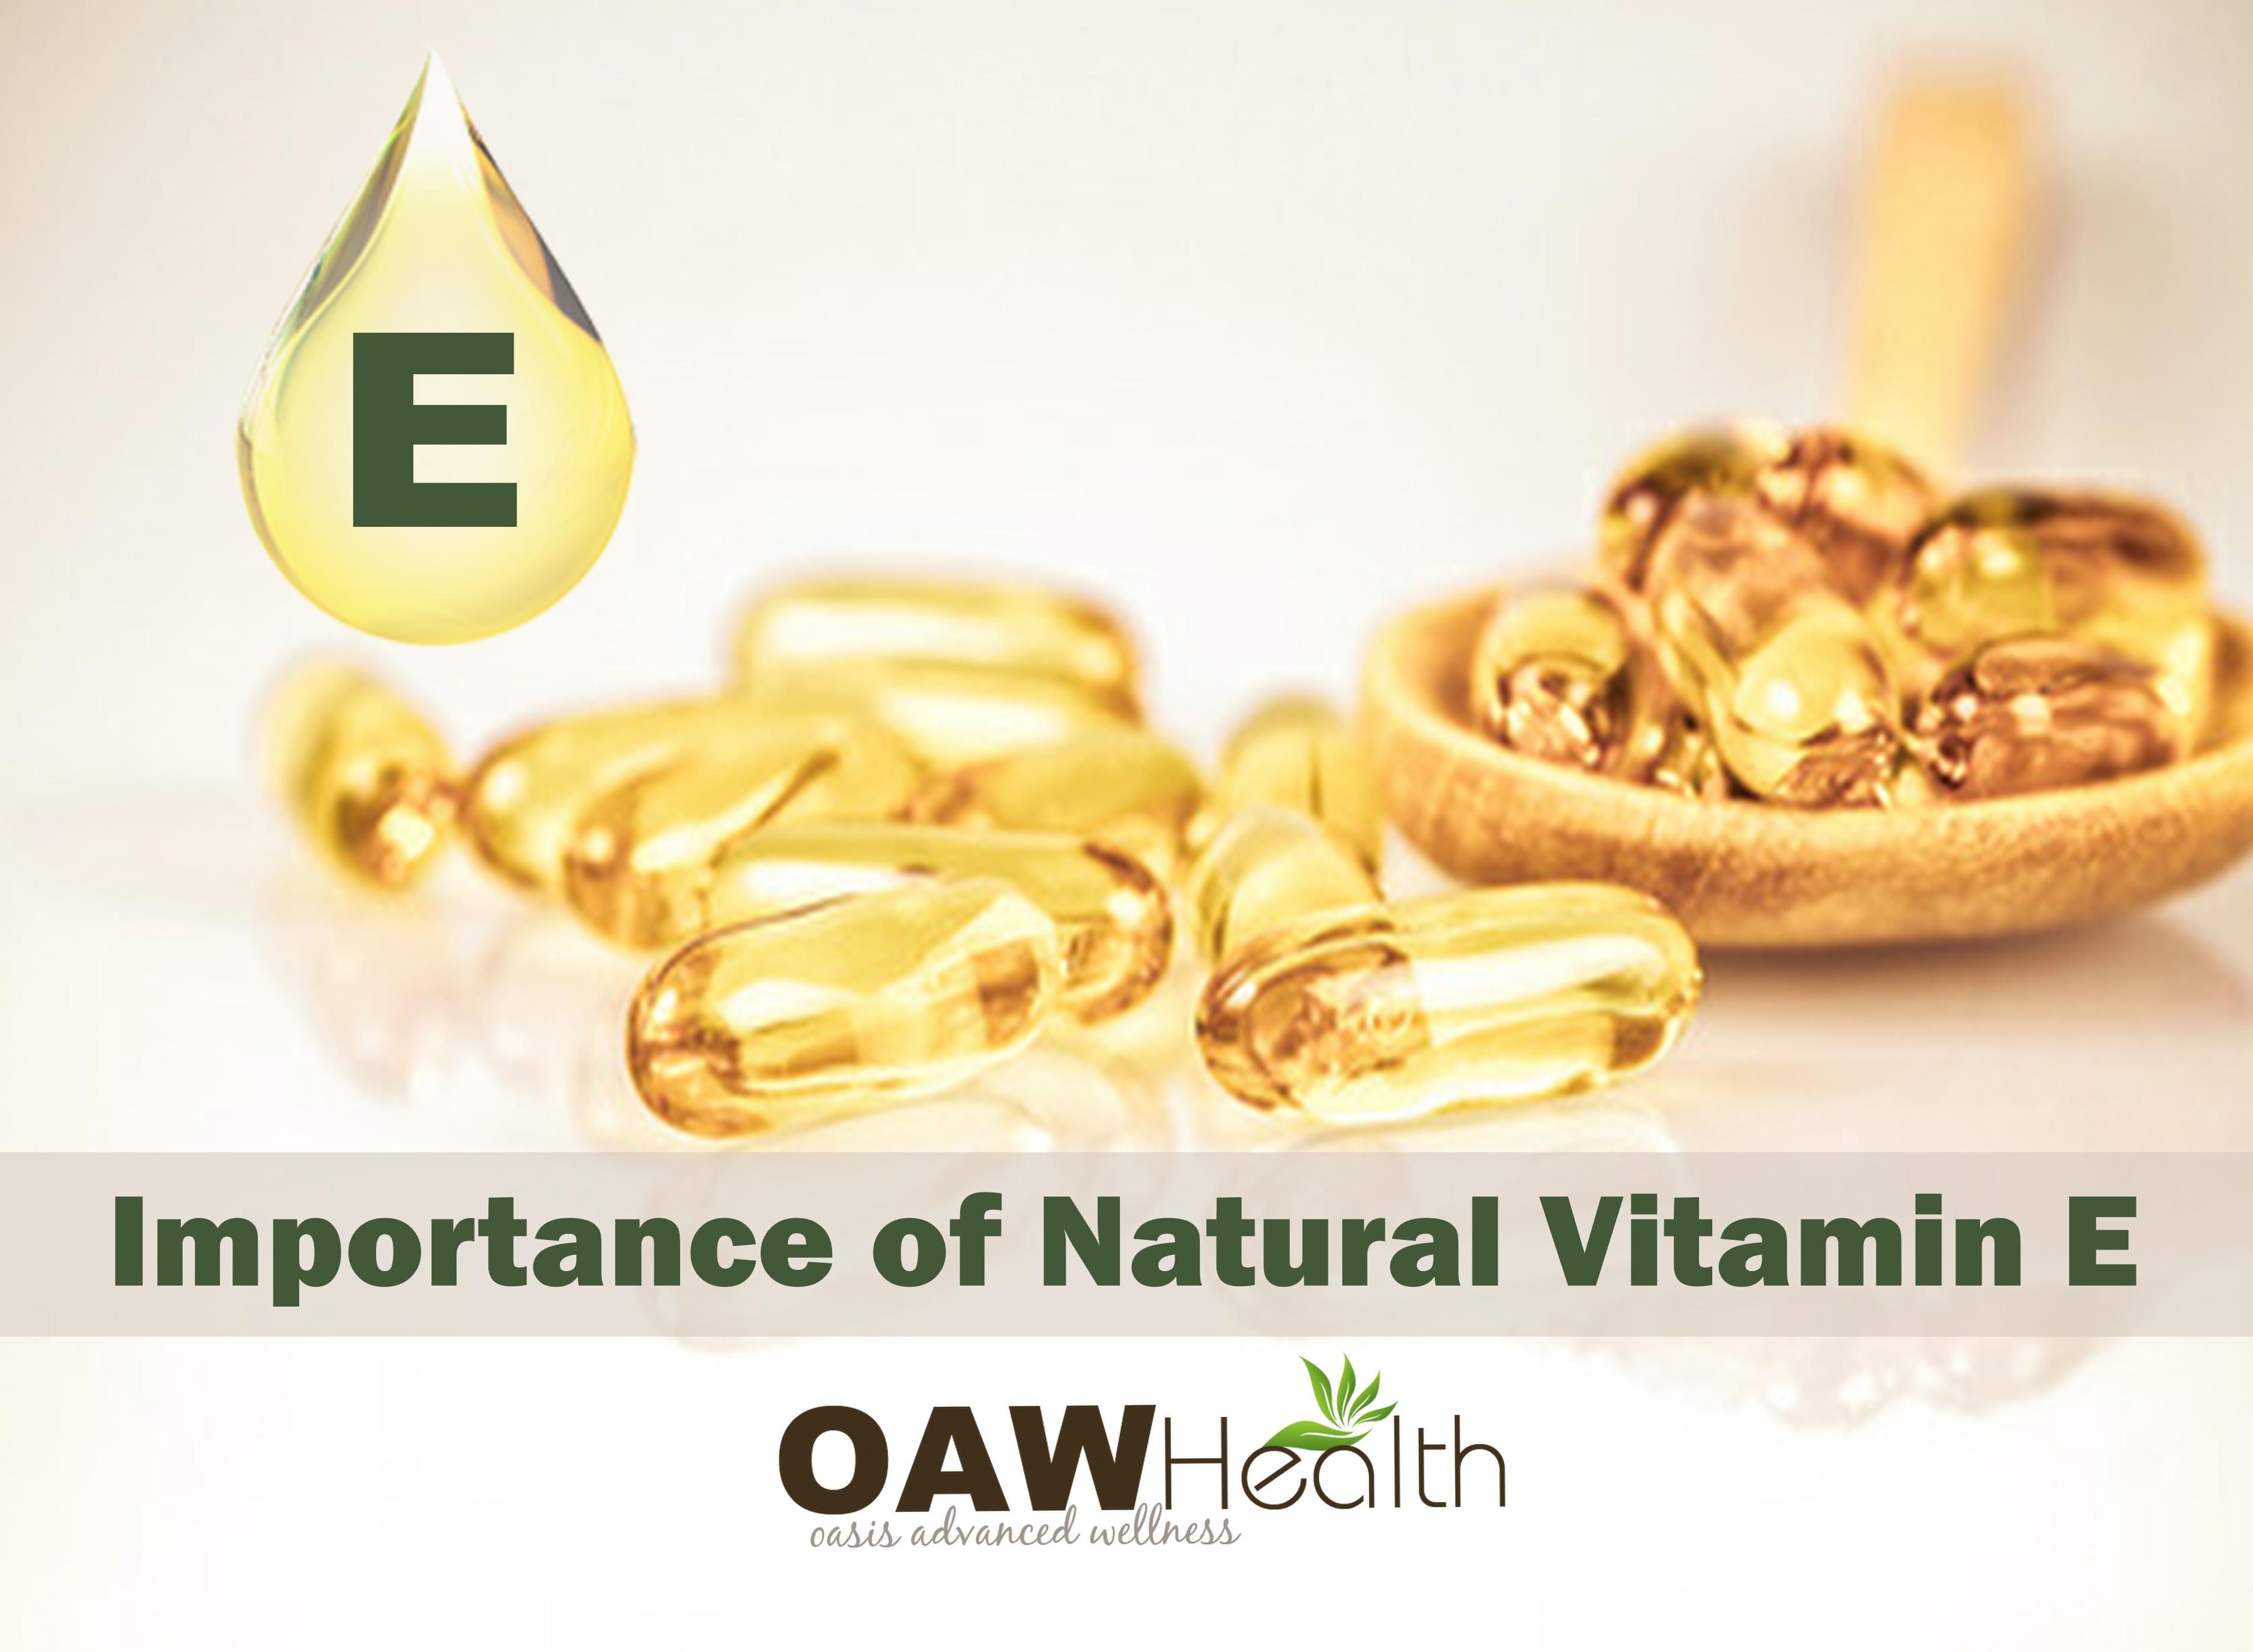 Importance of Natural Vitamin E